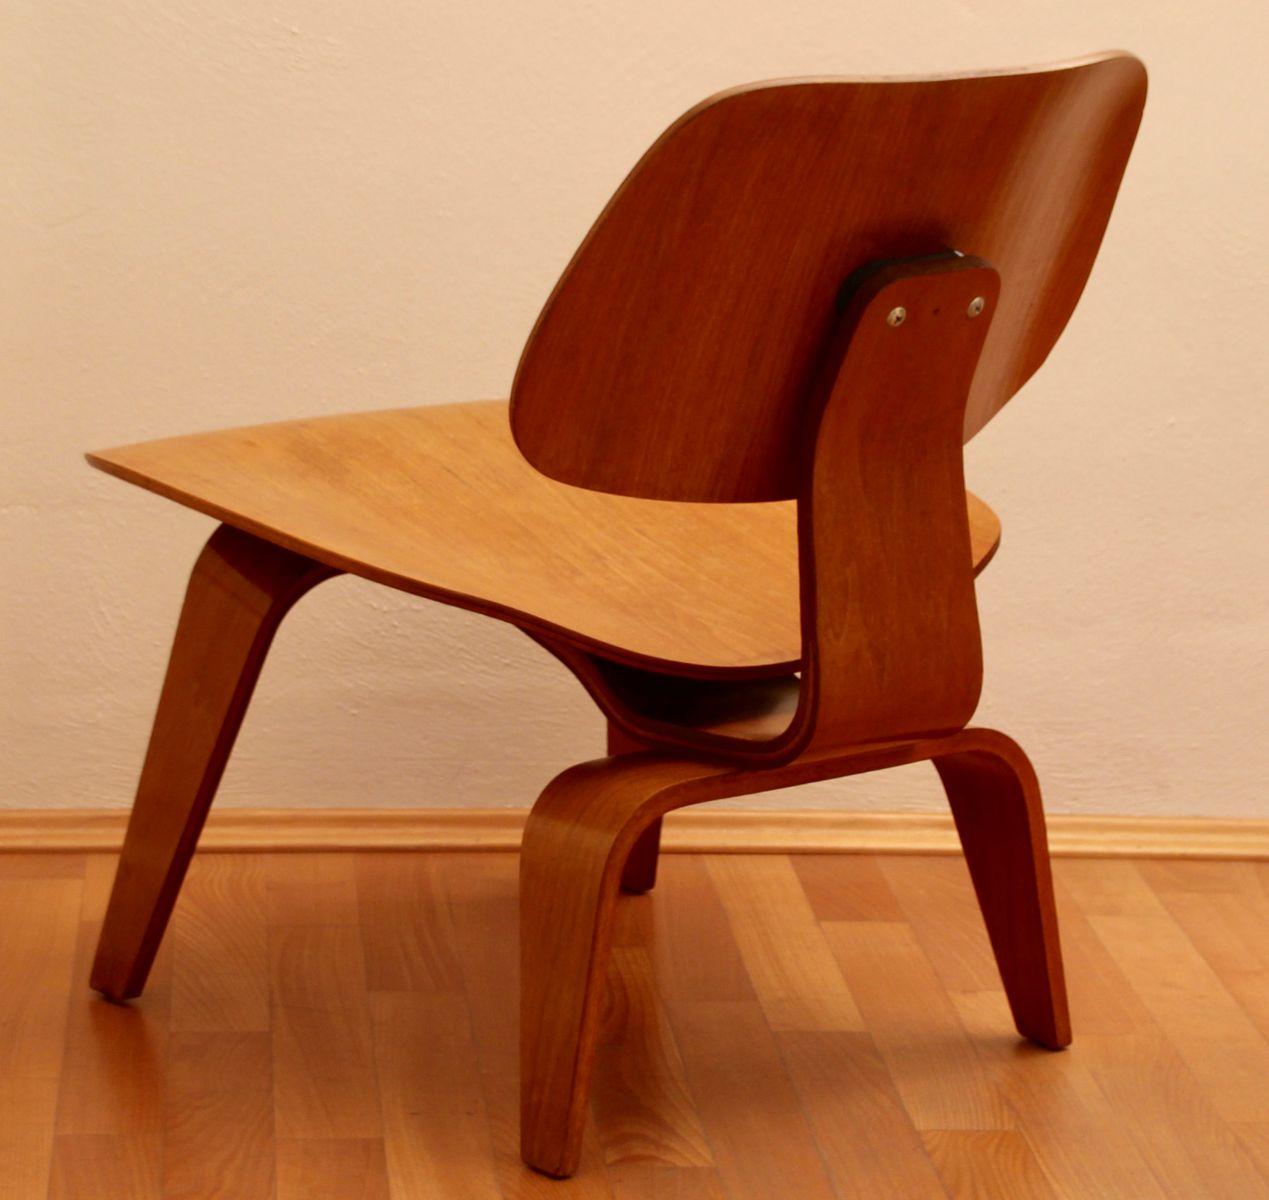 lcw stuhl von charles ray eames f r herman miller 1949 bei pamono kaufen. Black Bedroom Furniture Sets. Home Design Ideas